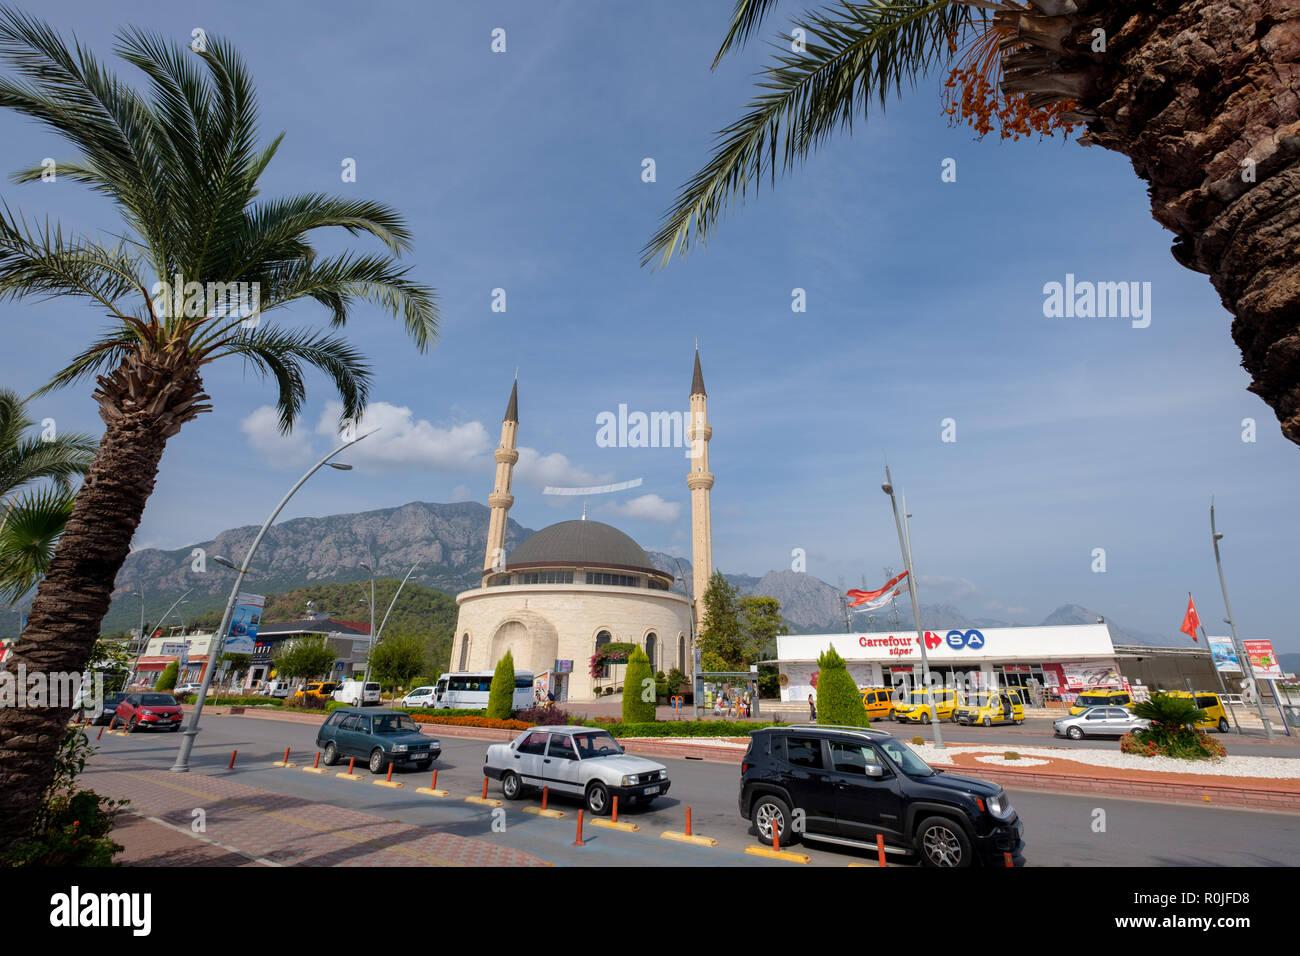 Huzur Cami Islamic mosque in Kemer, Antalya province, Turkey - Stock Image